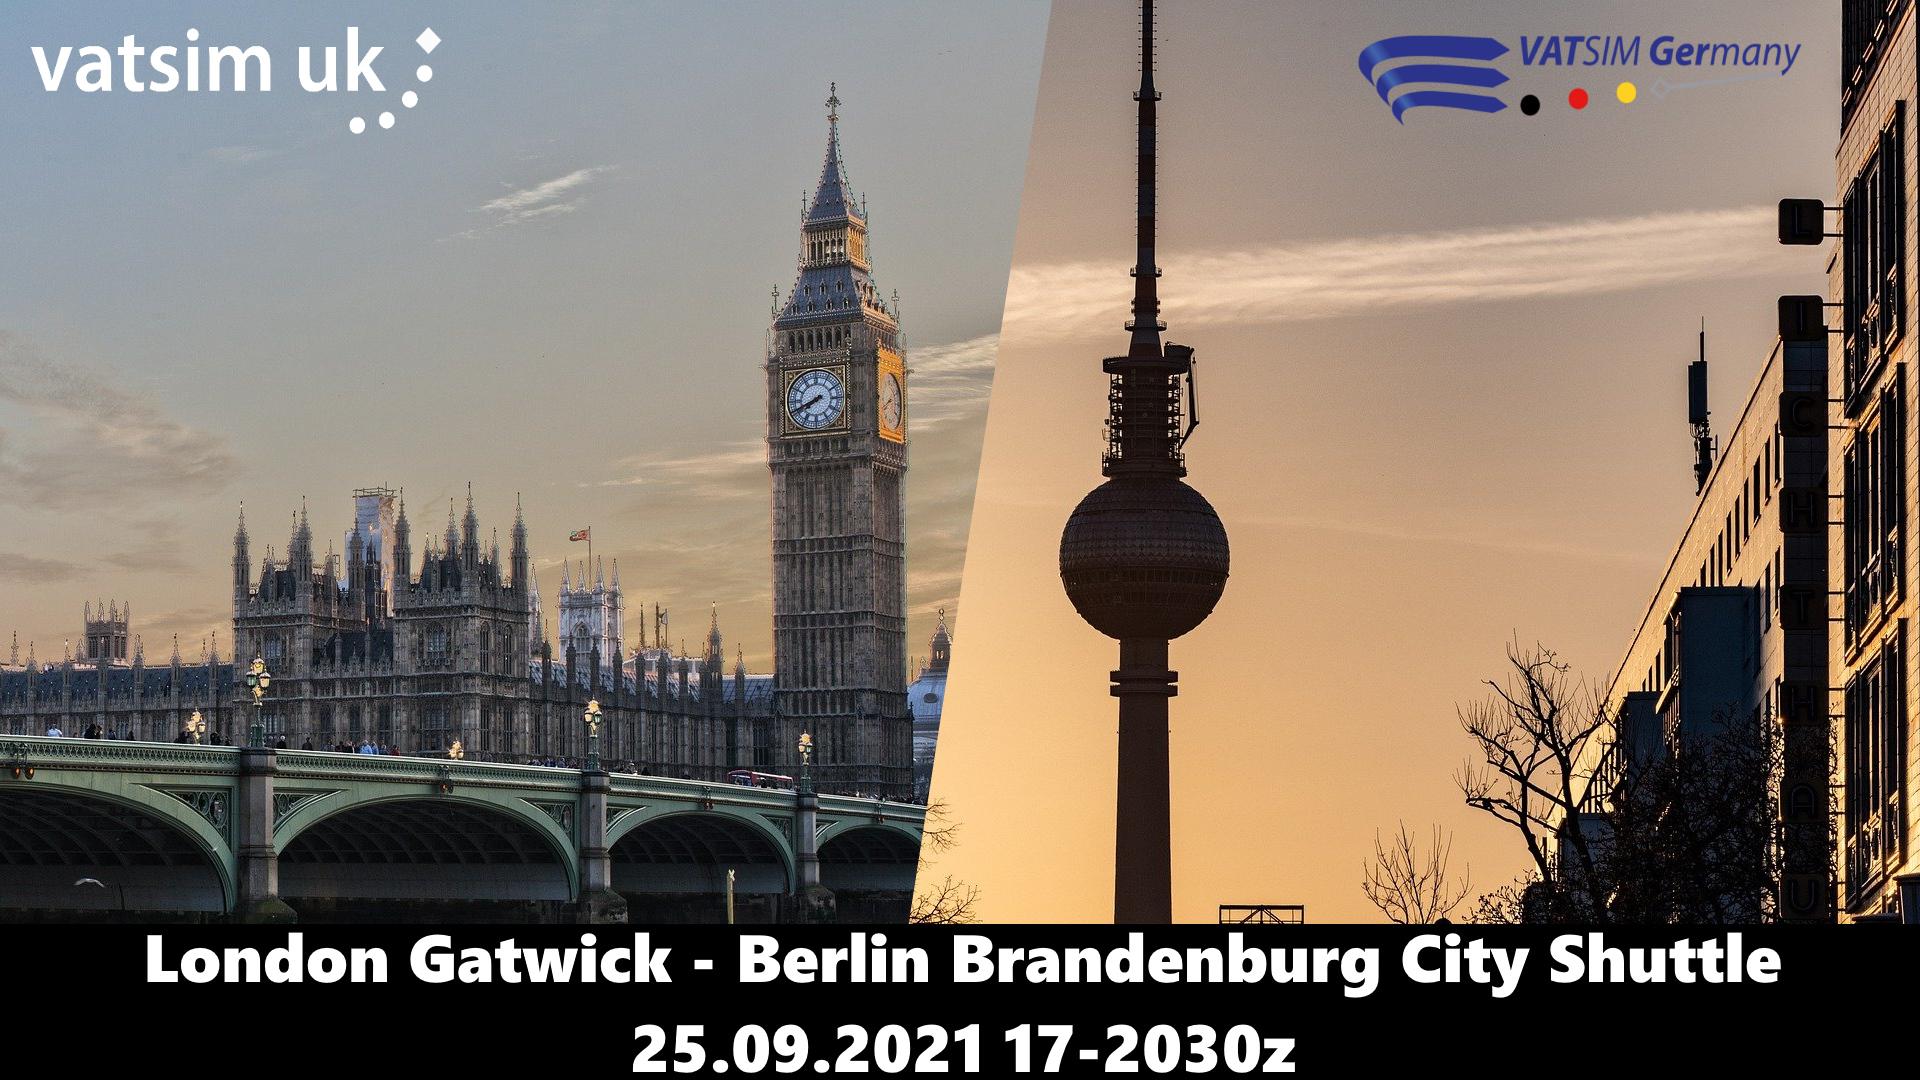 London Gatwick-Berlin Brandenburg City Shuttle - Virtual Norwegian Events